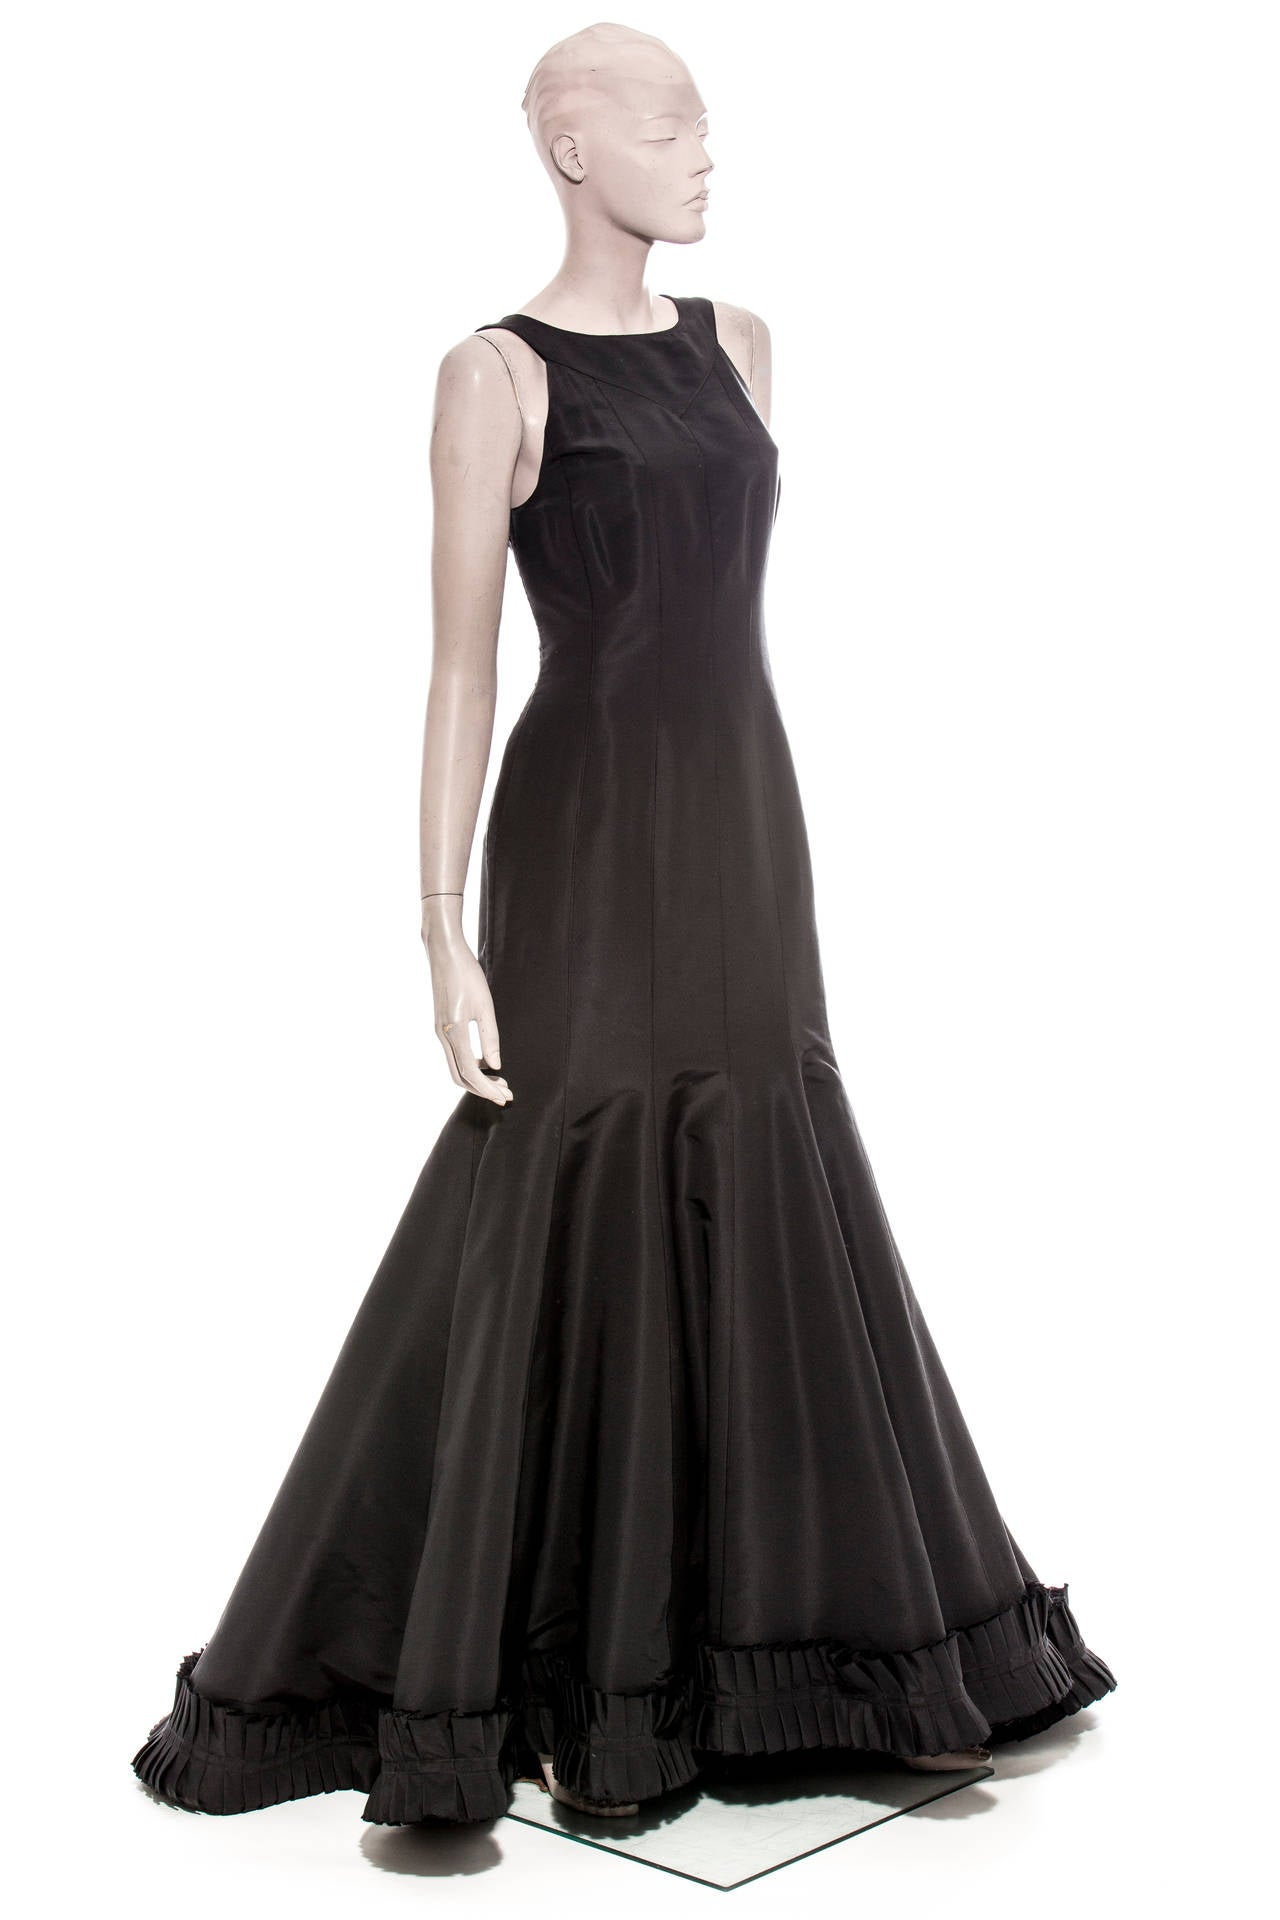 c4cffff652a5 Oscar de la Renta Sleeveless Black Silk Faille Evening Dress, Spring 2007  In Excellent Condition